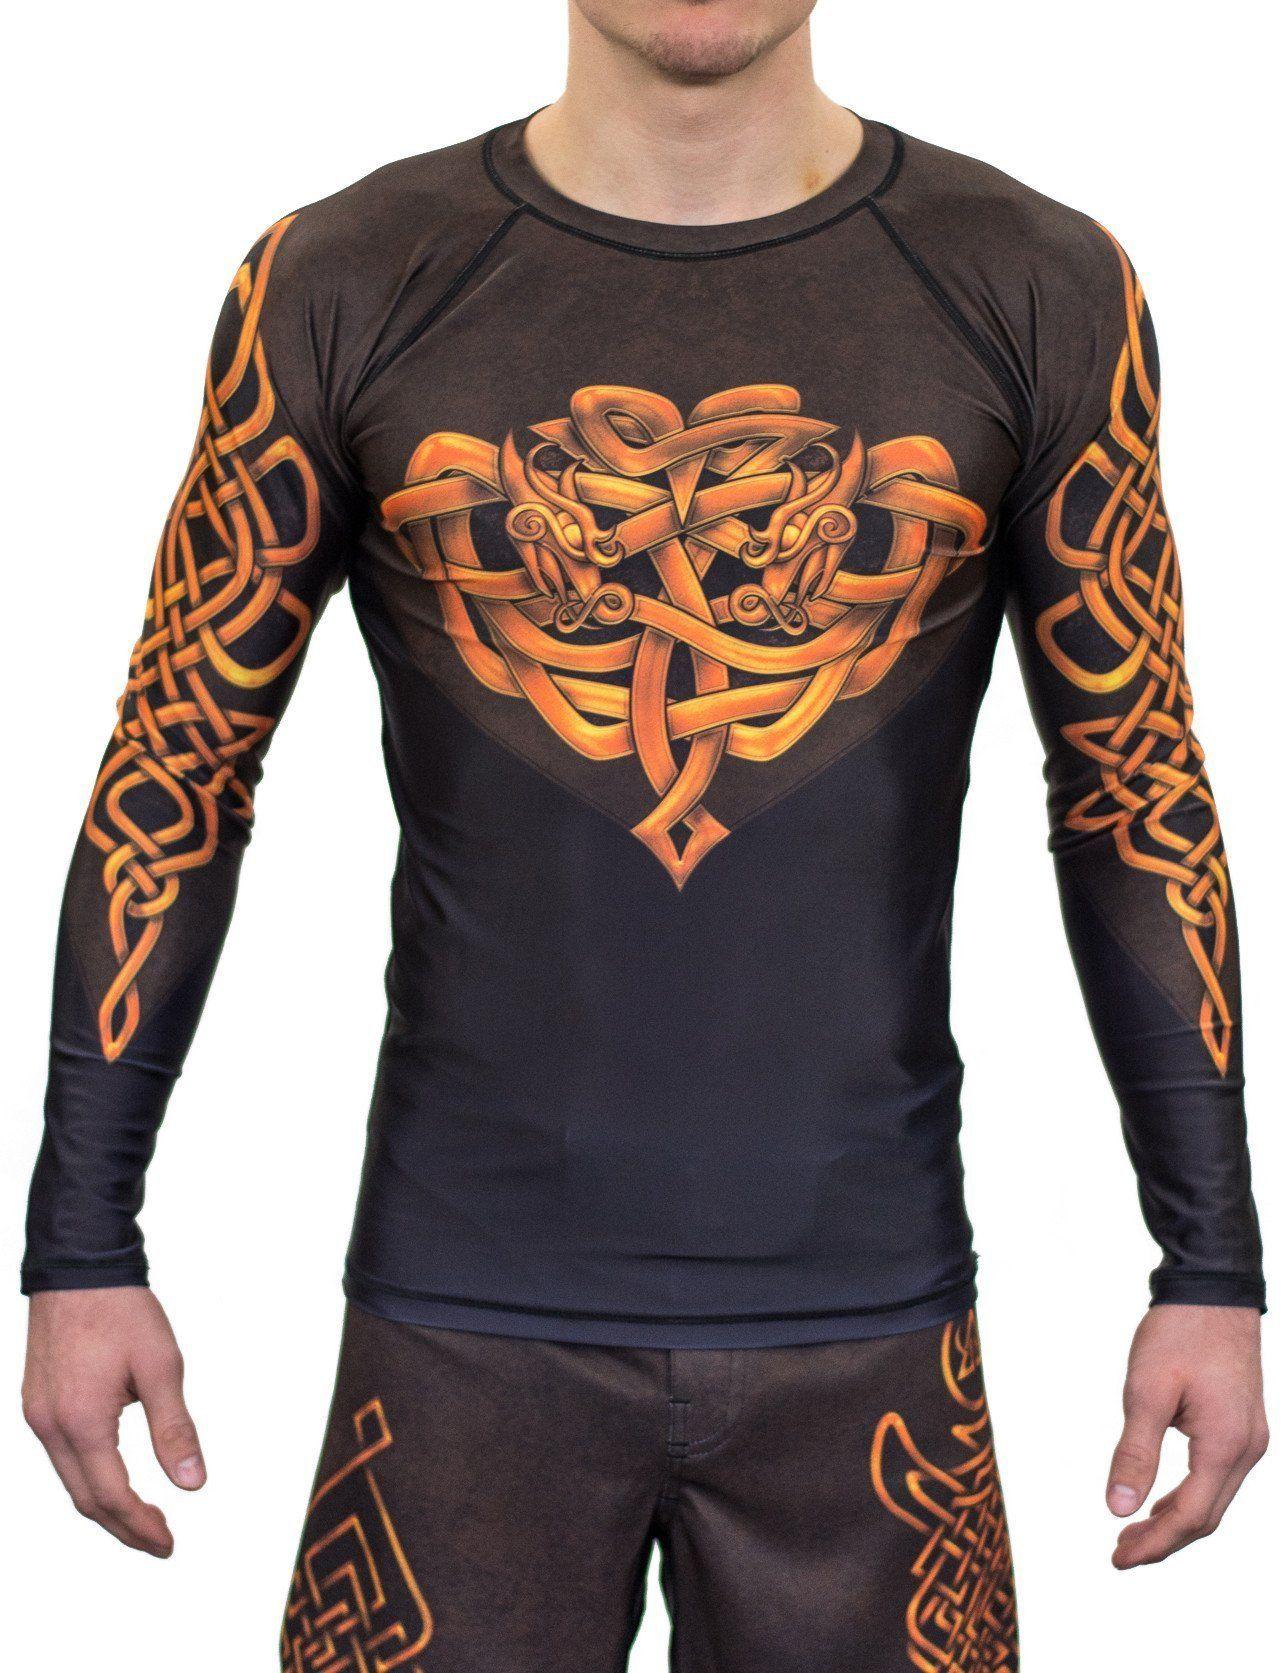 Viking Tribal Short Sleeve Rashguard